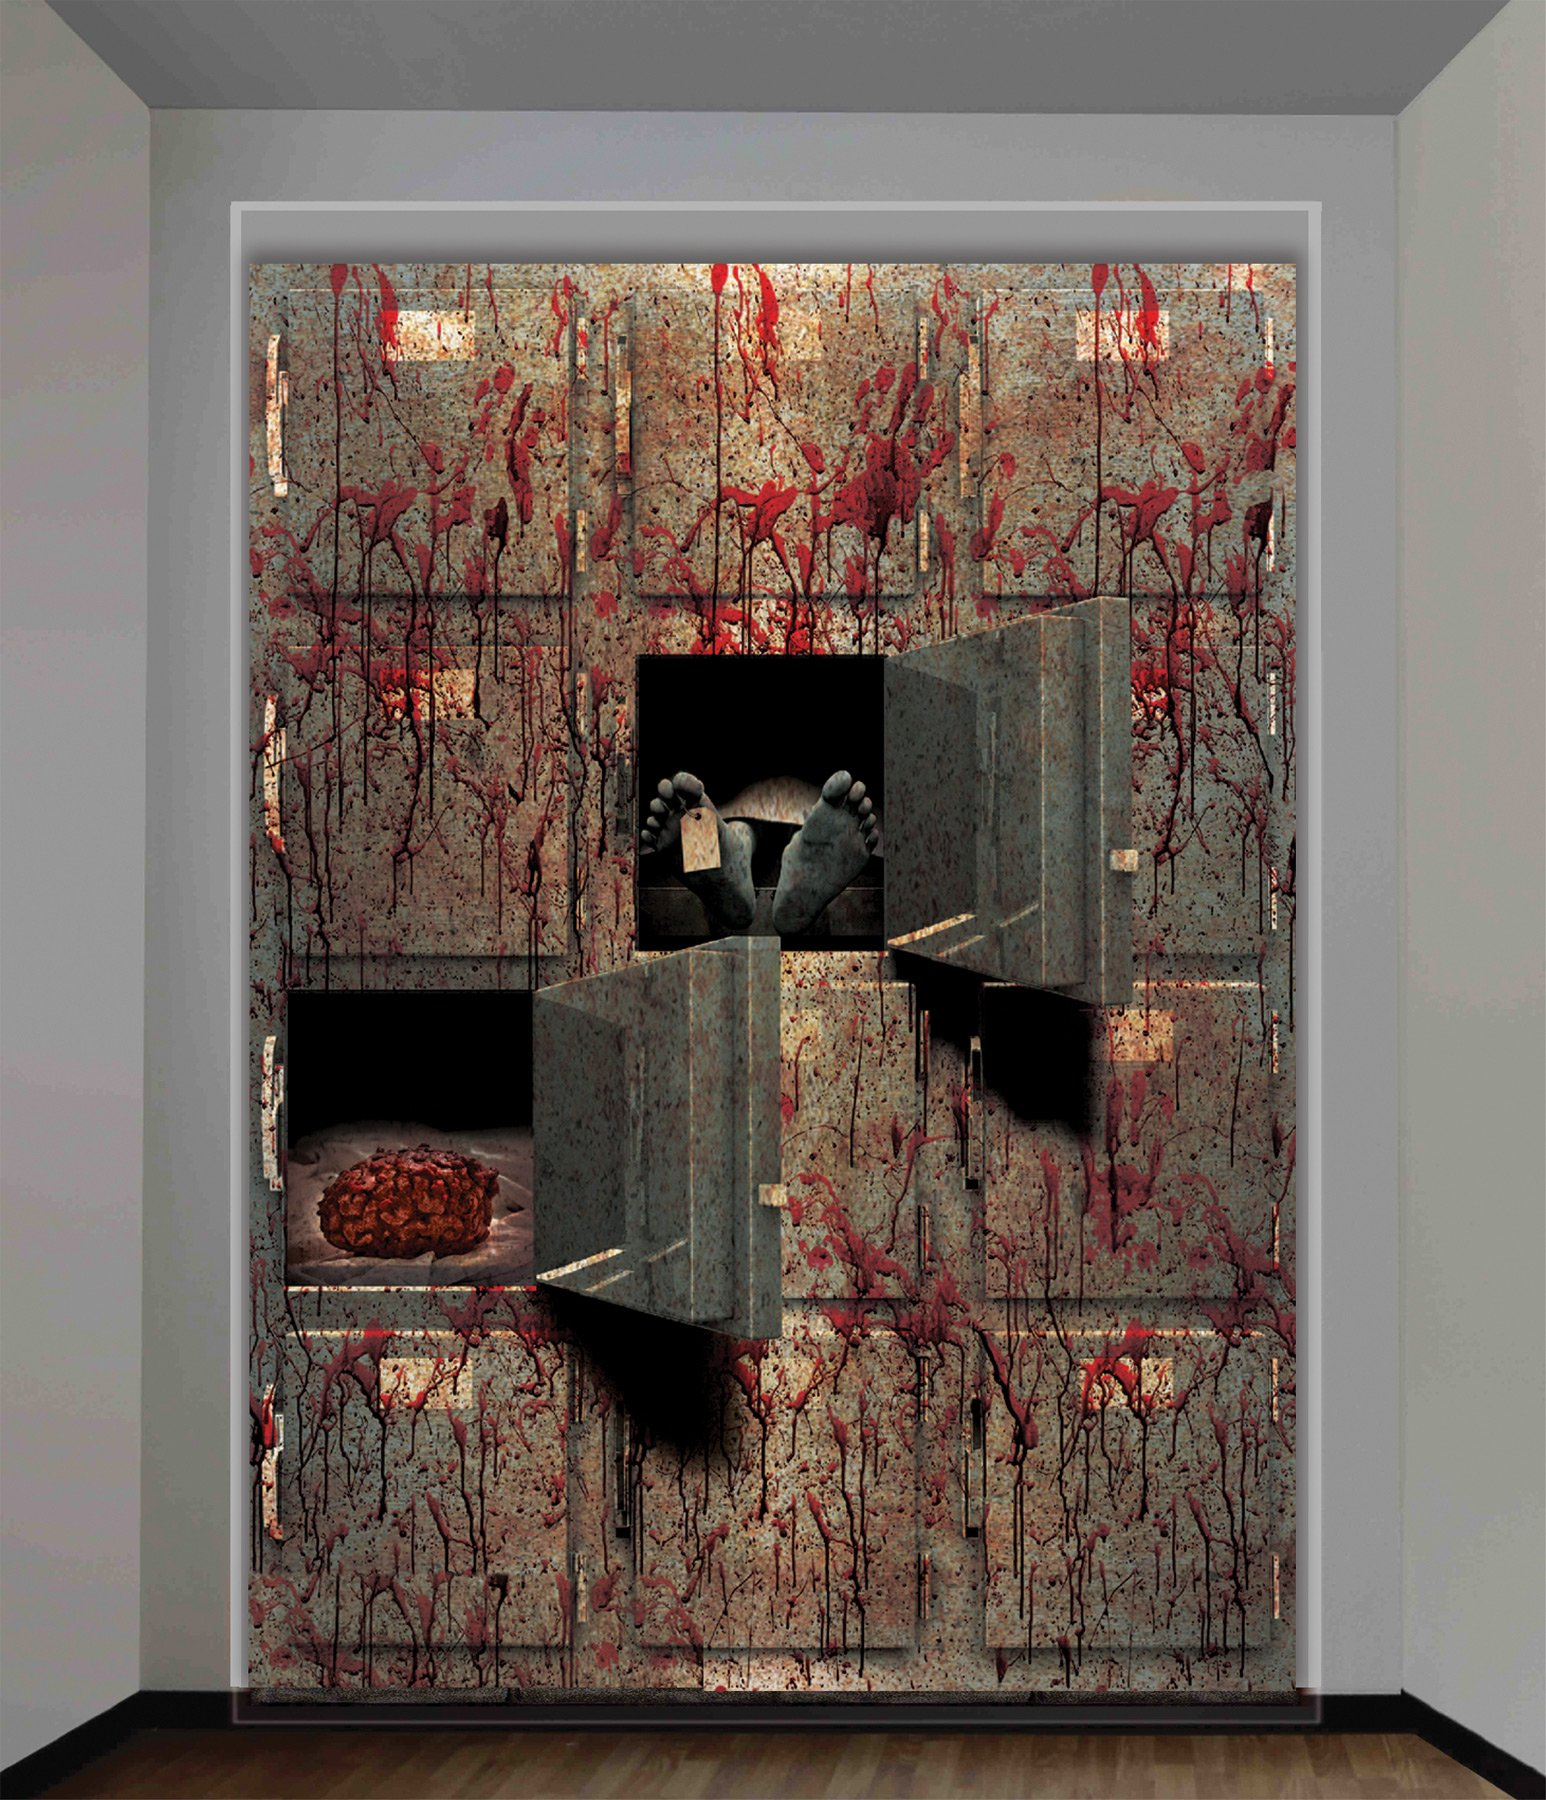 Morgue Wall Decoration 4Ft X 5Ft